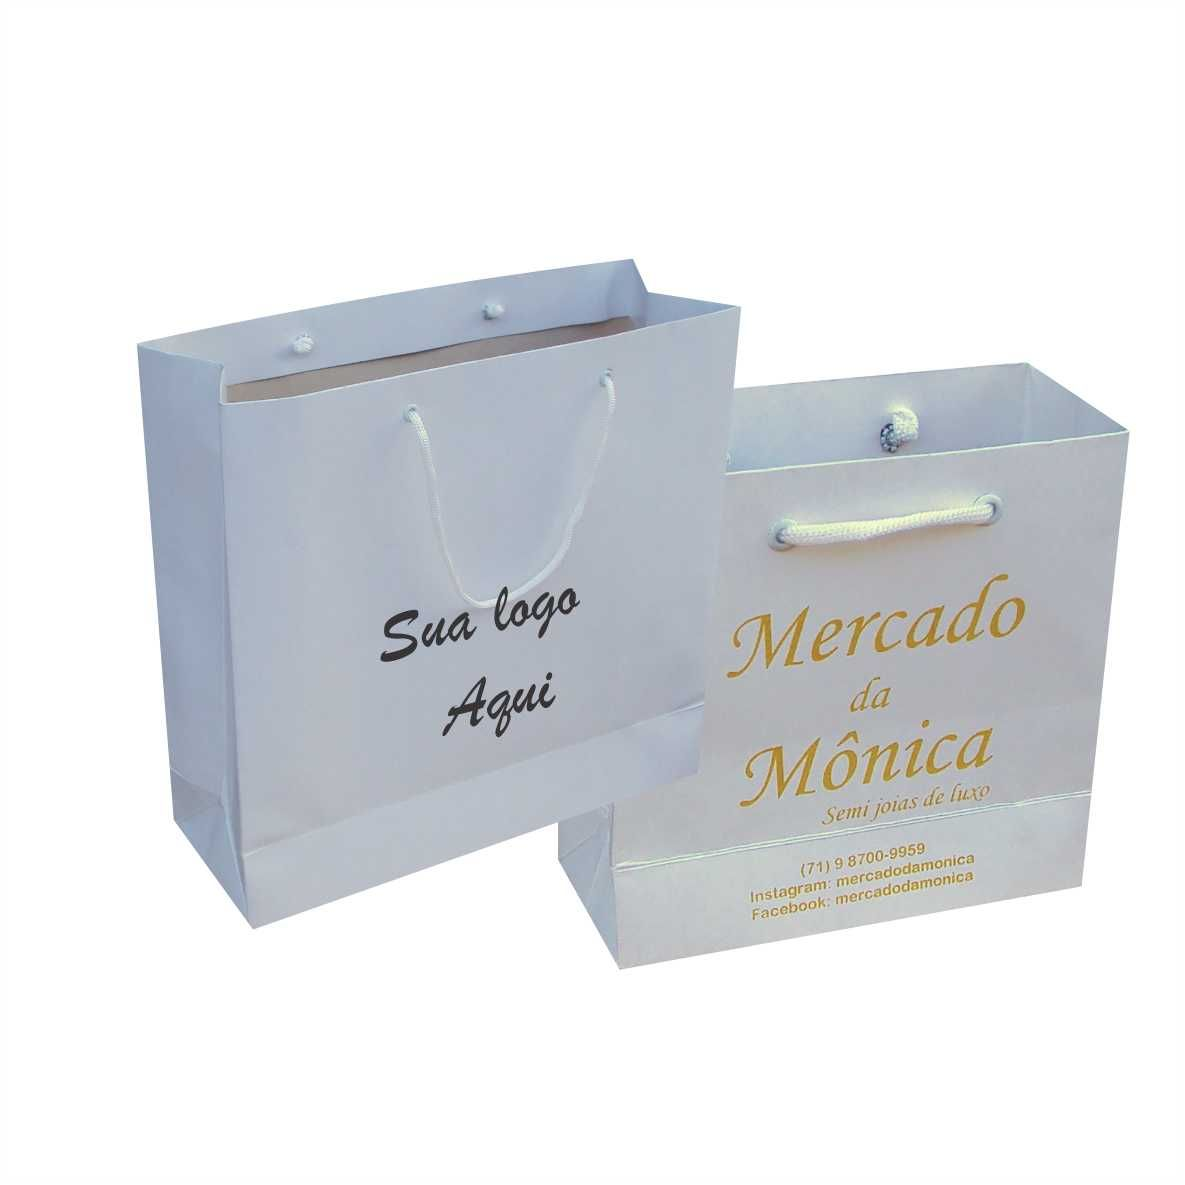 Sacola  kraft pequena cor branca (15x15x6,5 cm) personalizada - 100 unidades